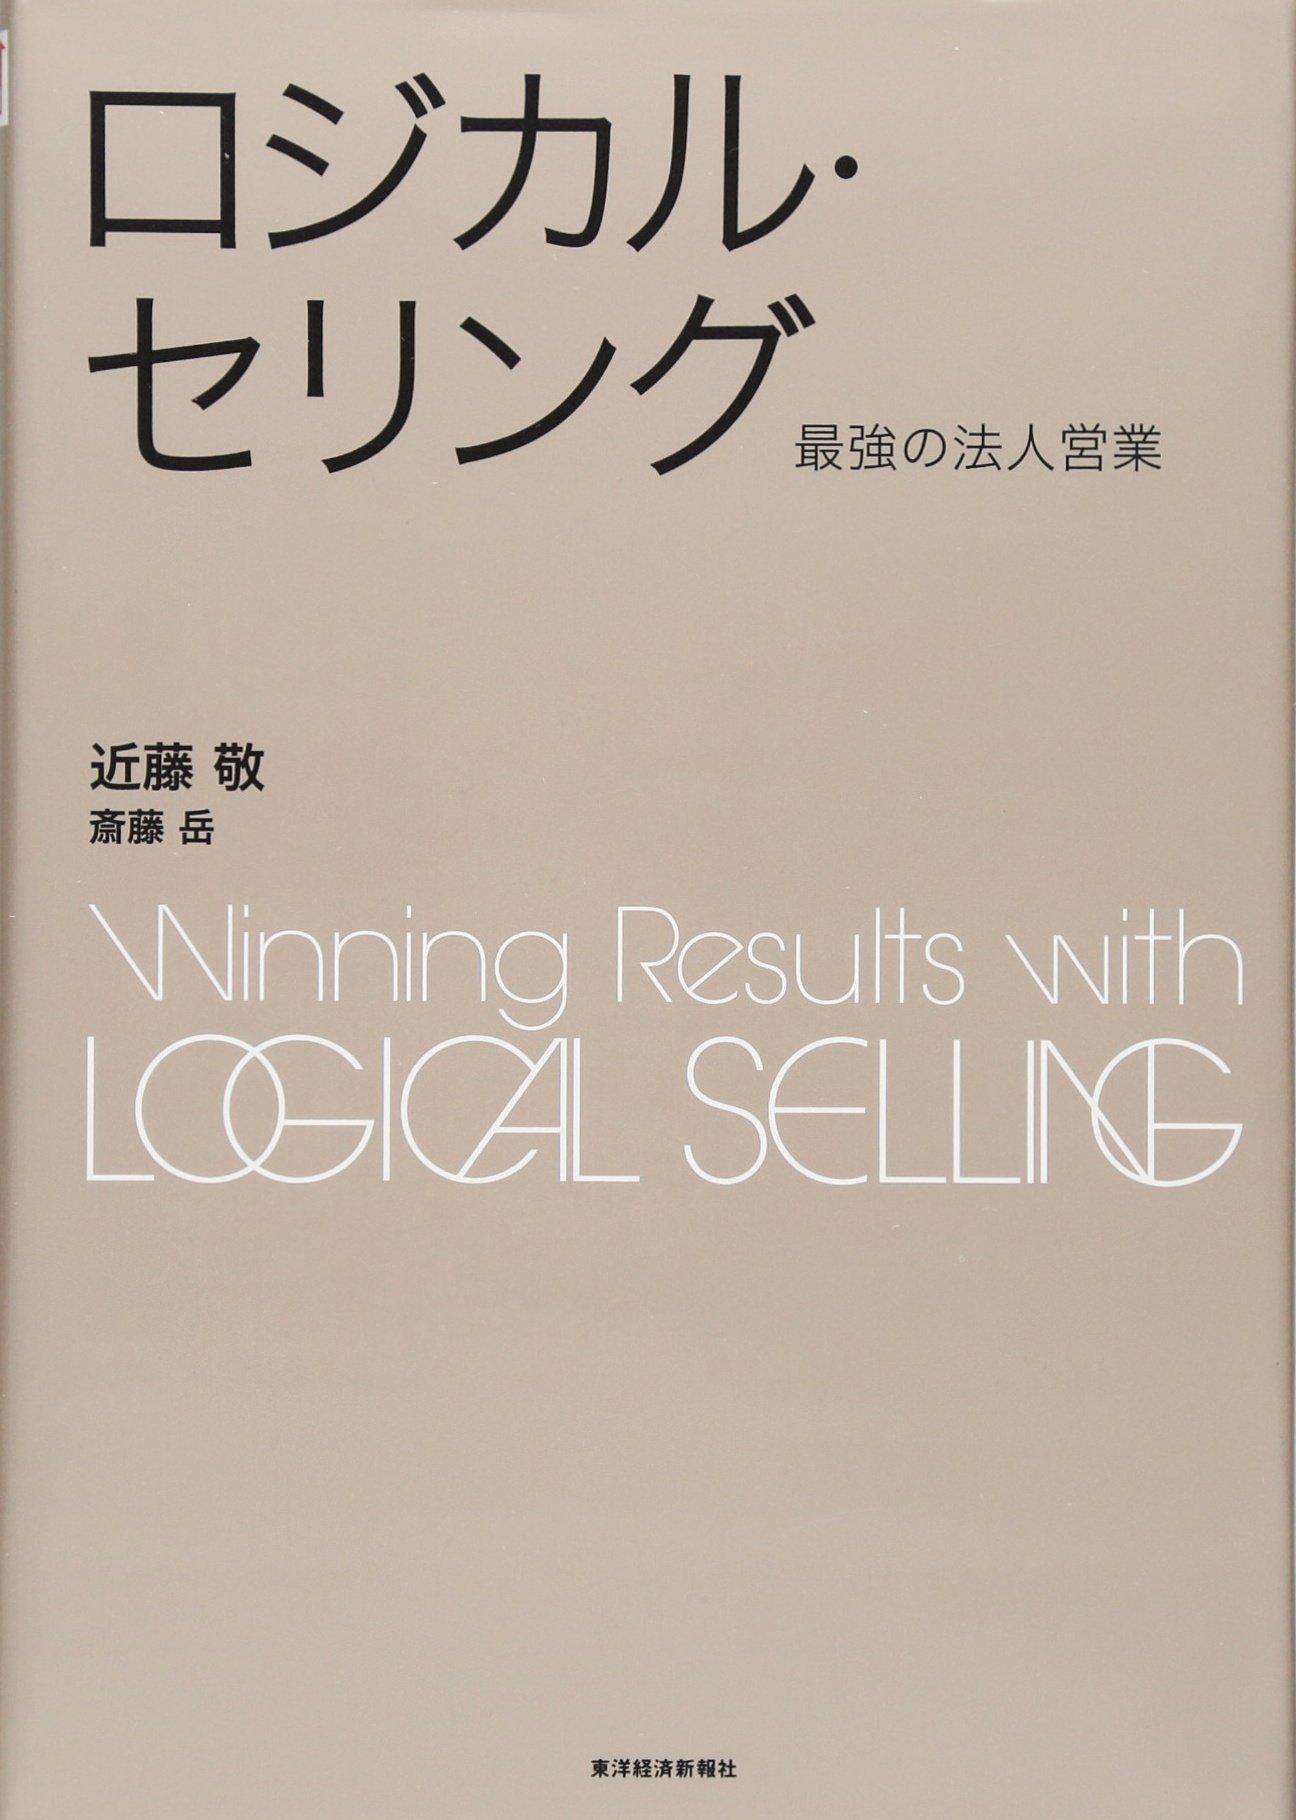 Download Rojikaru seringu : Saikyō no hōjin eigyō pdf epub